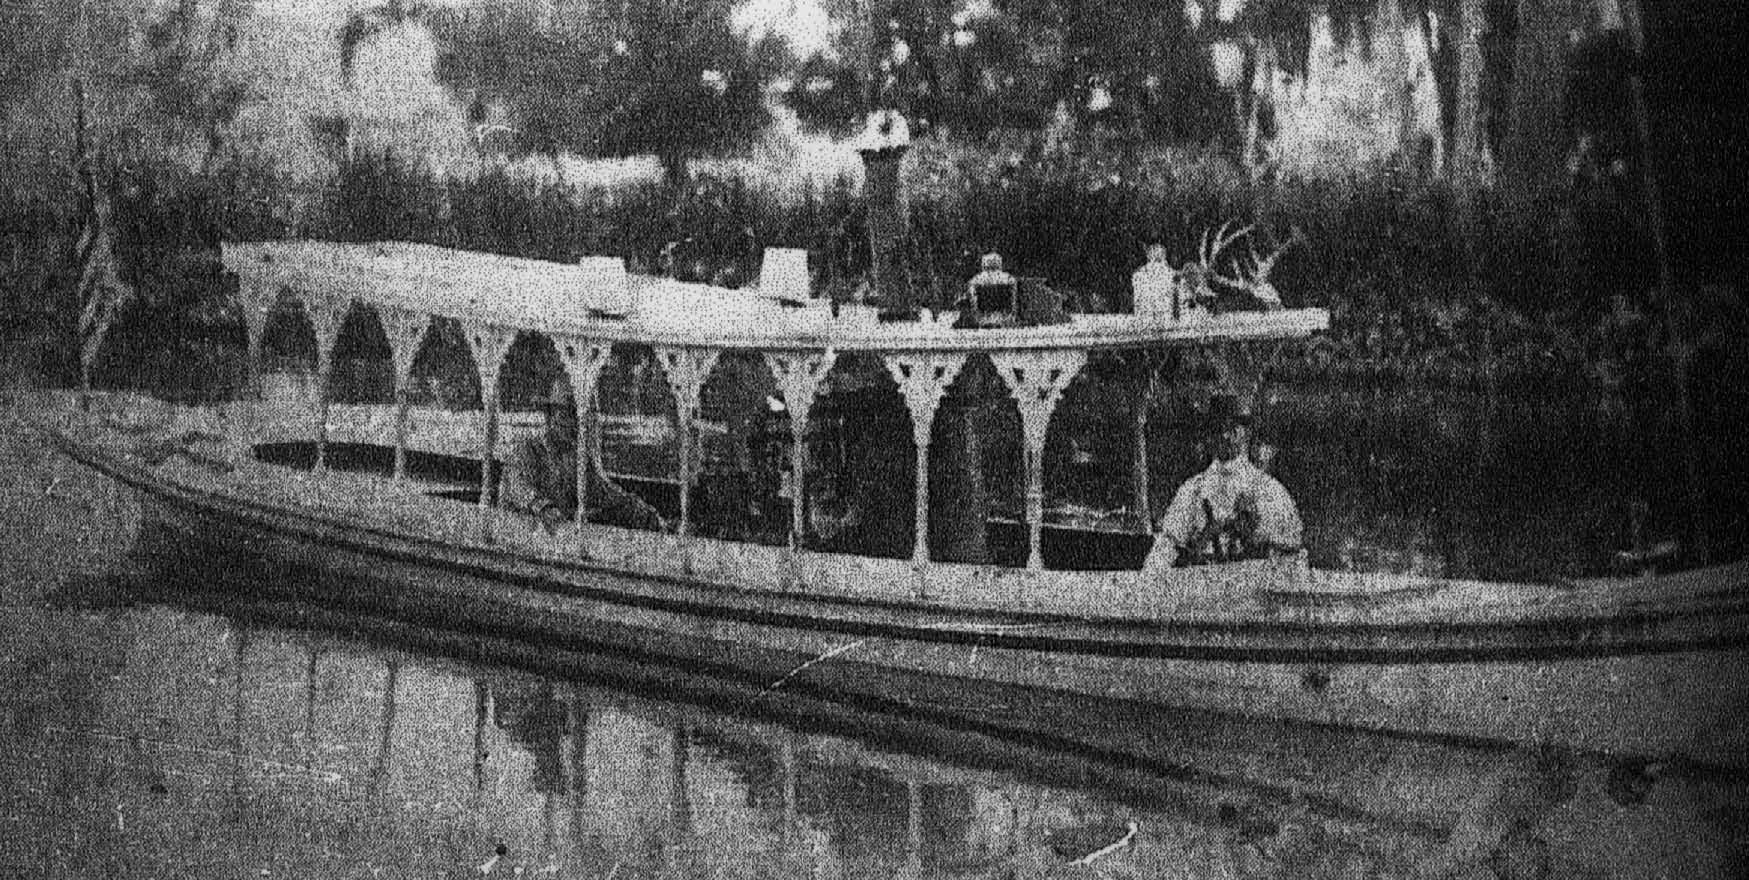 Bayou Des Allemands Foot Ferry